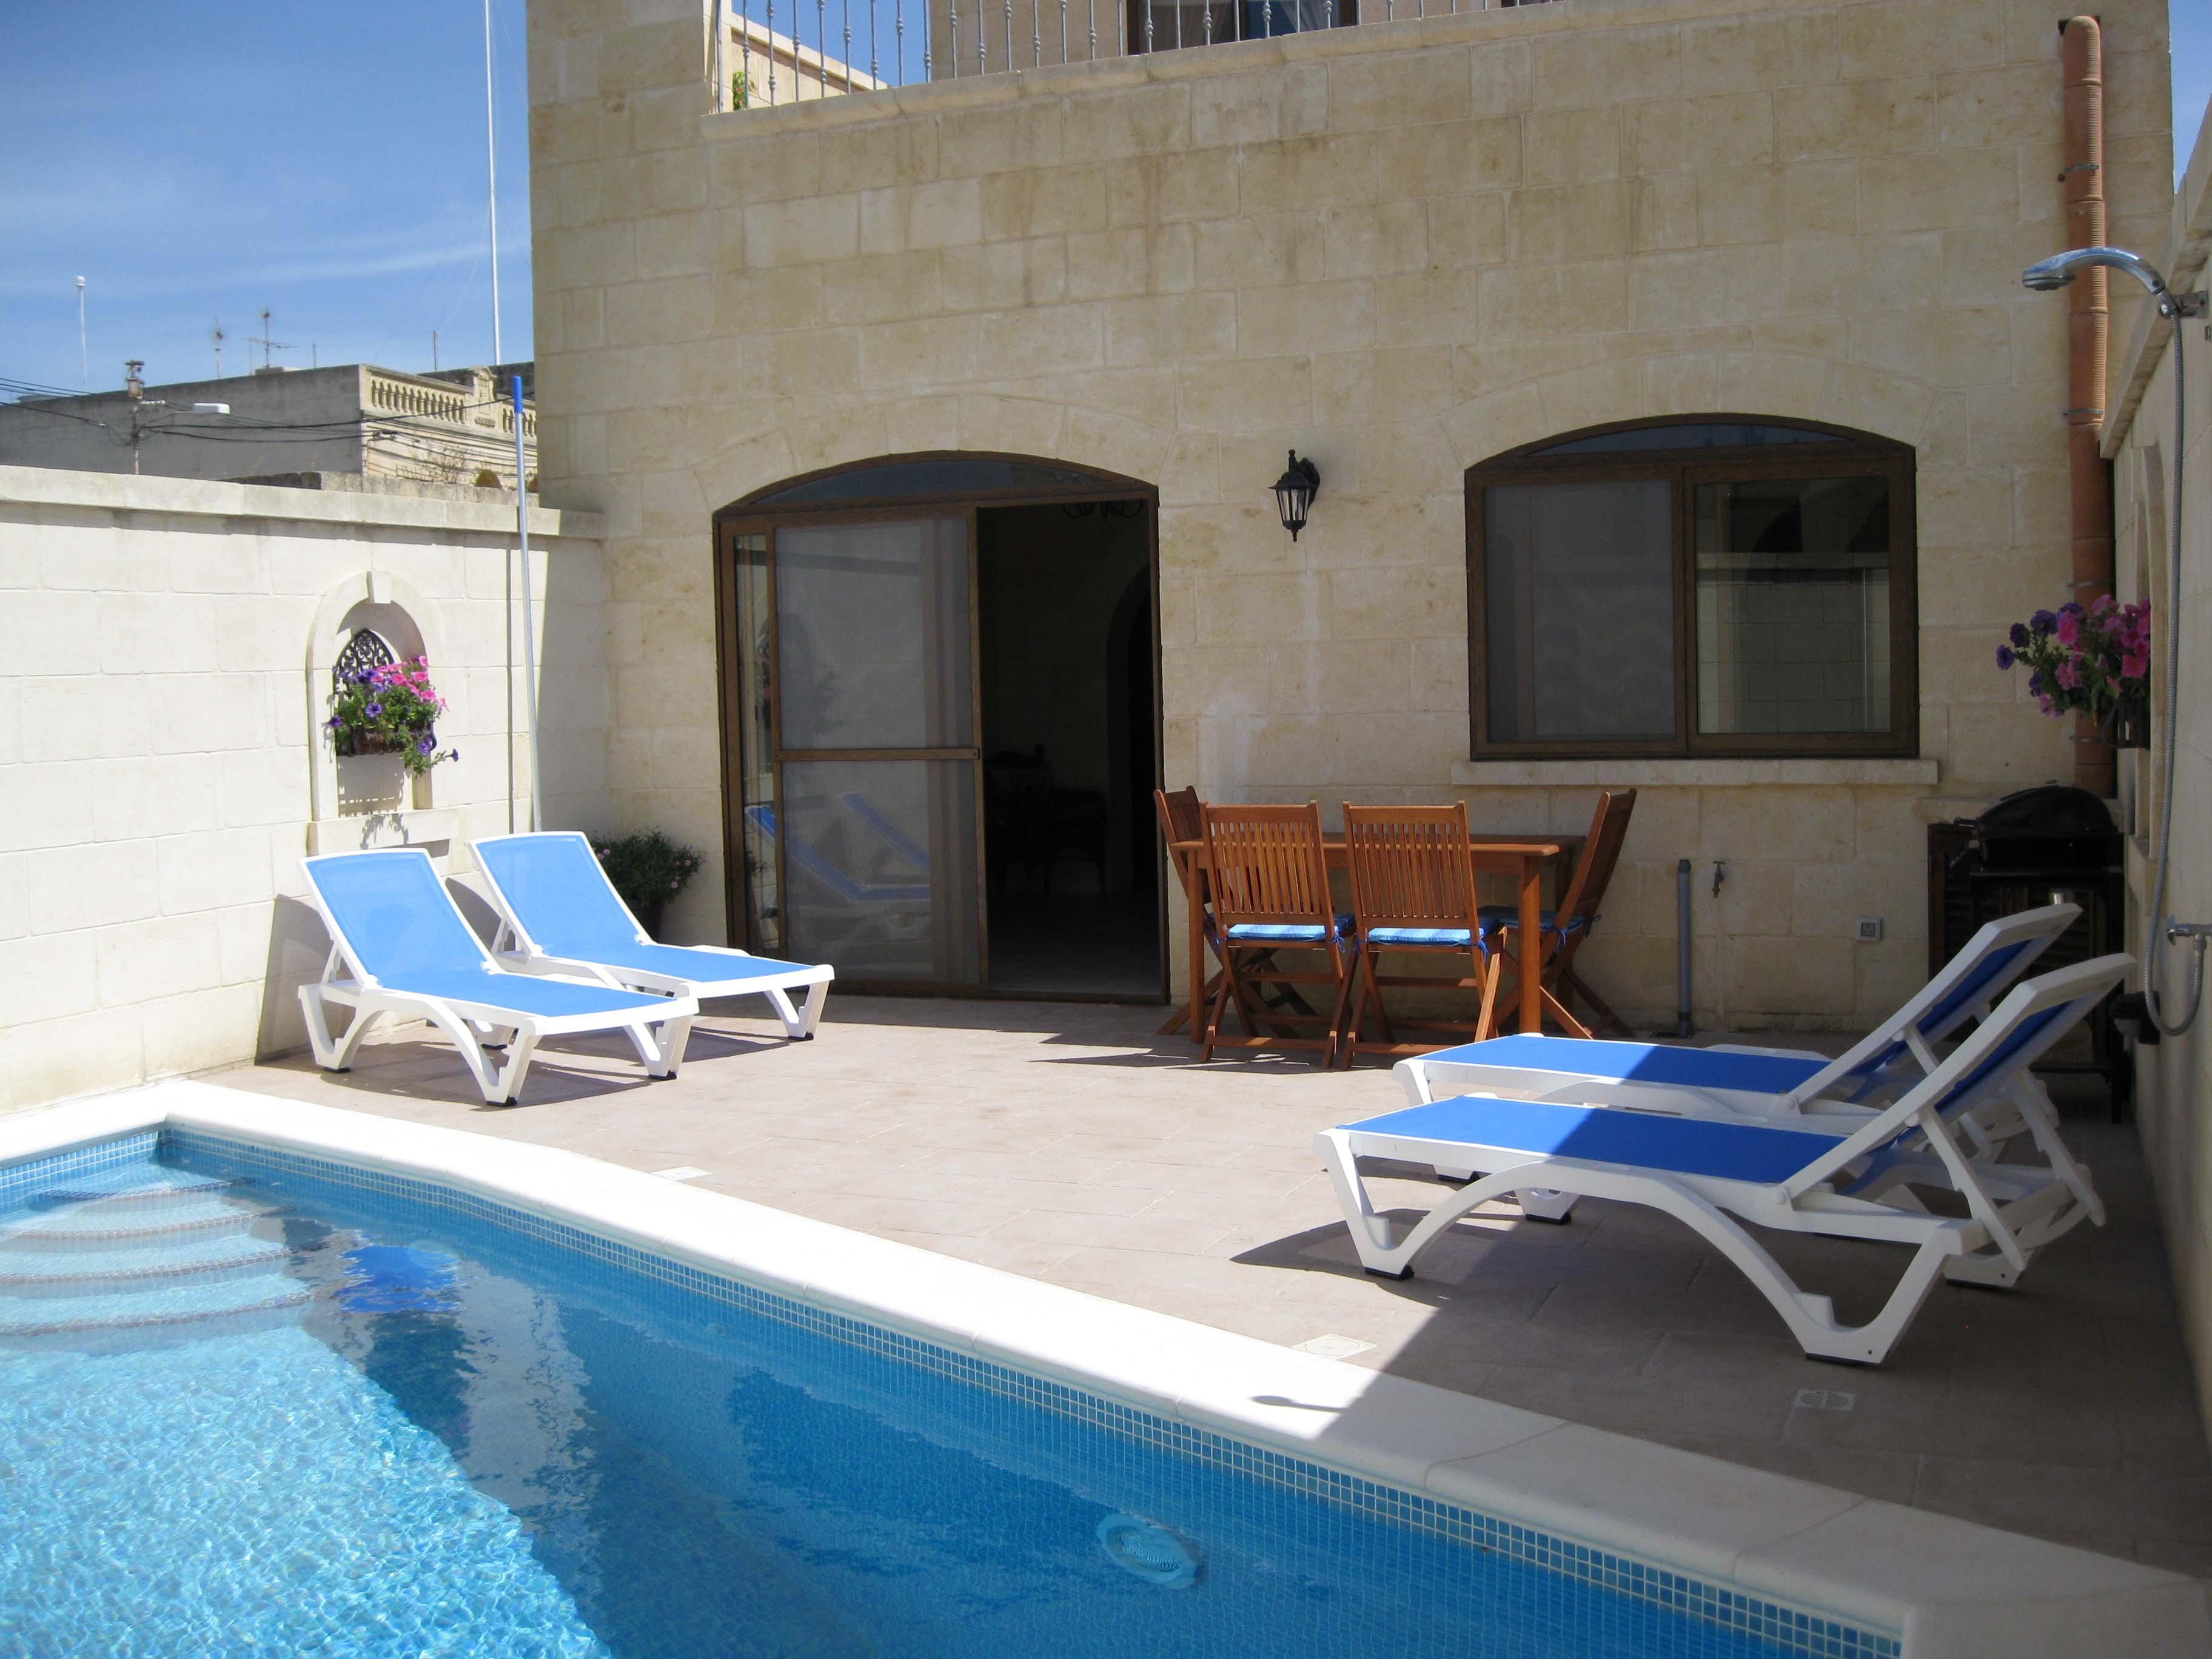 Tranquility farmhouse fh065 farmhouse nadur gozo malta for Pool design malta